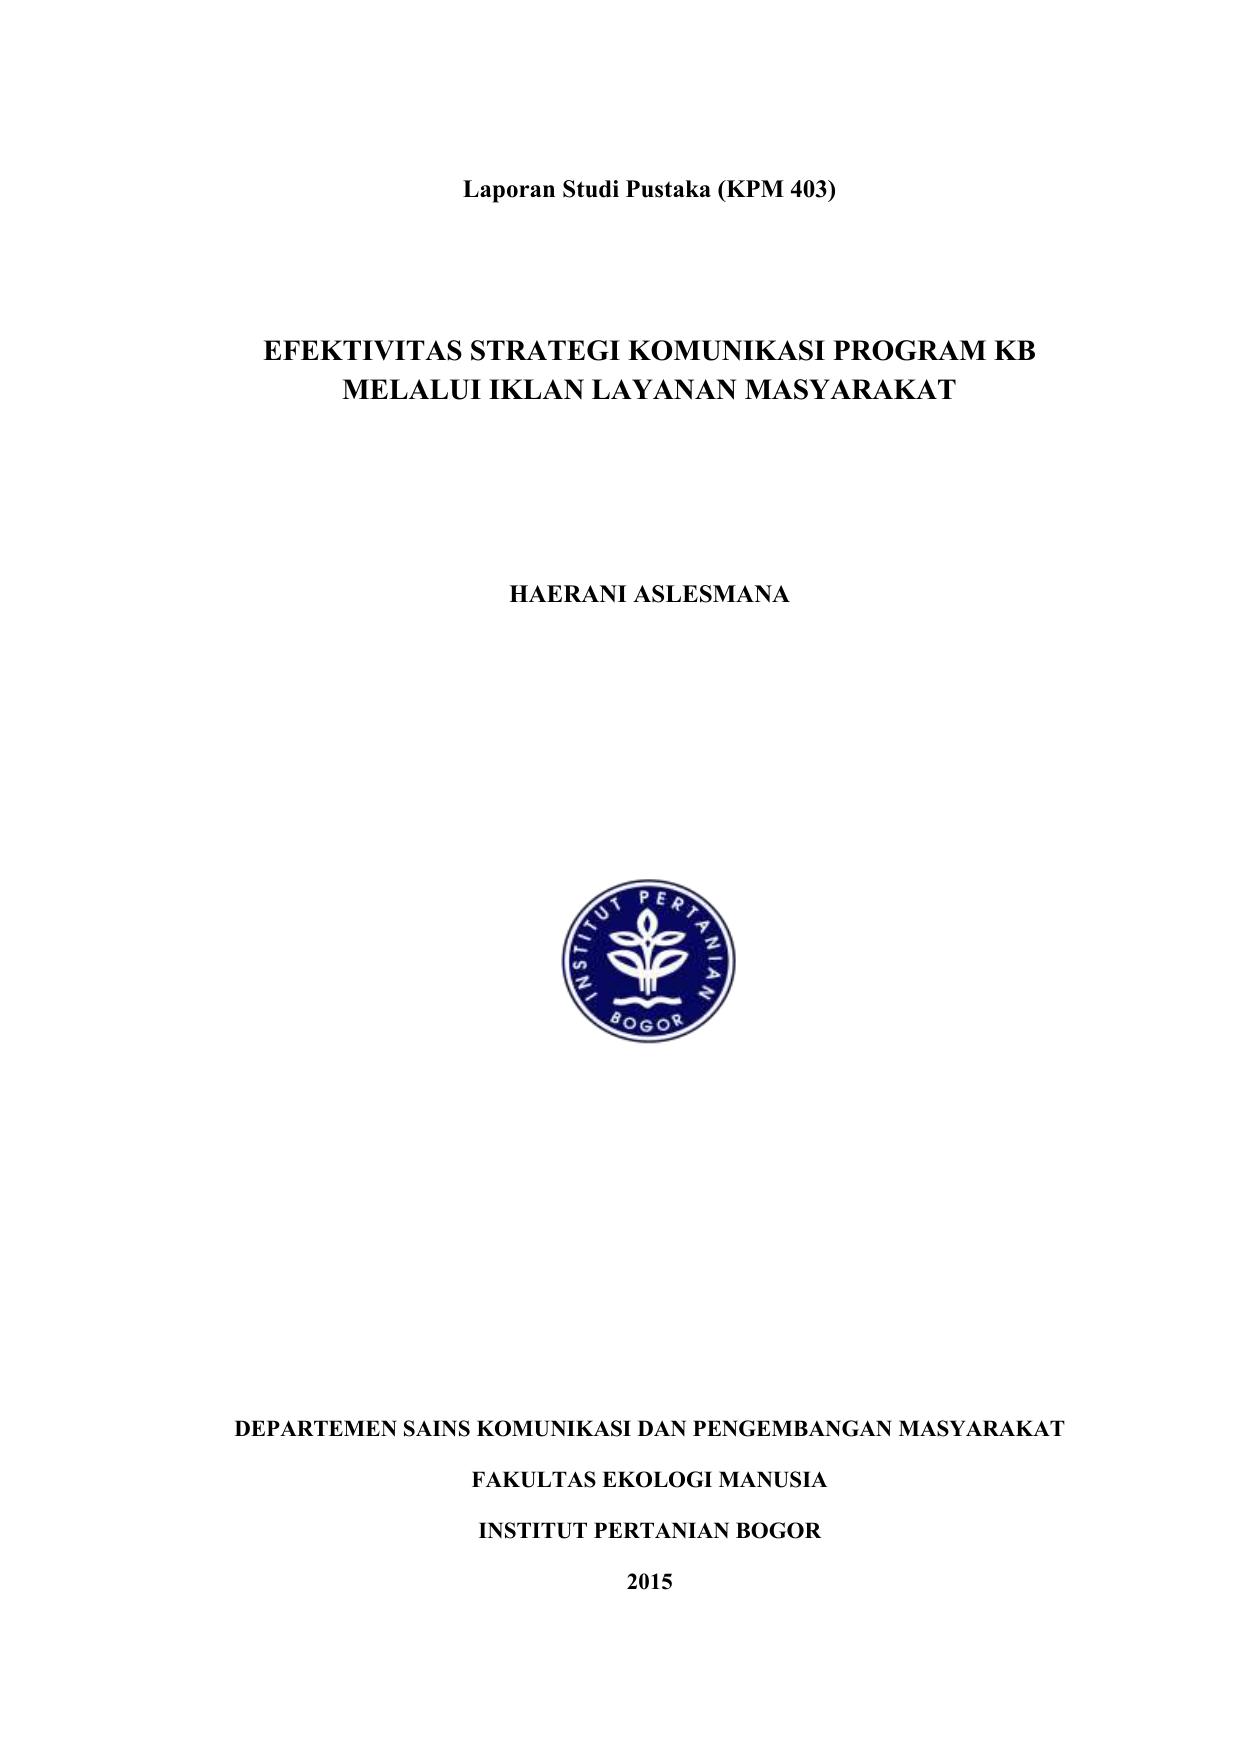 Strategi Komunikasi Program Kb